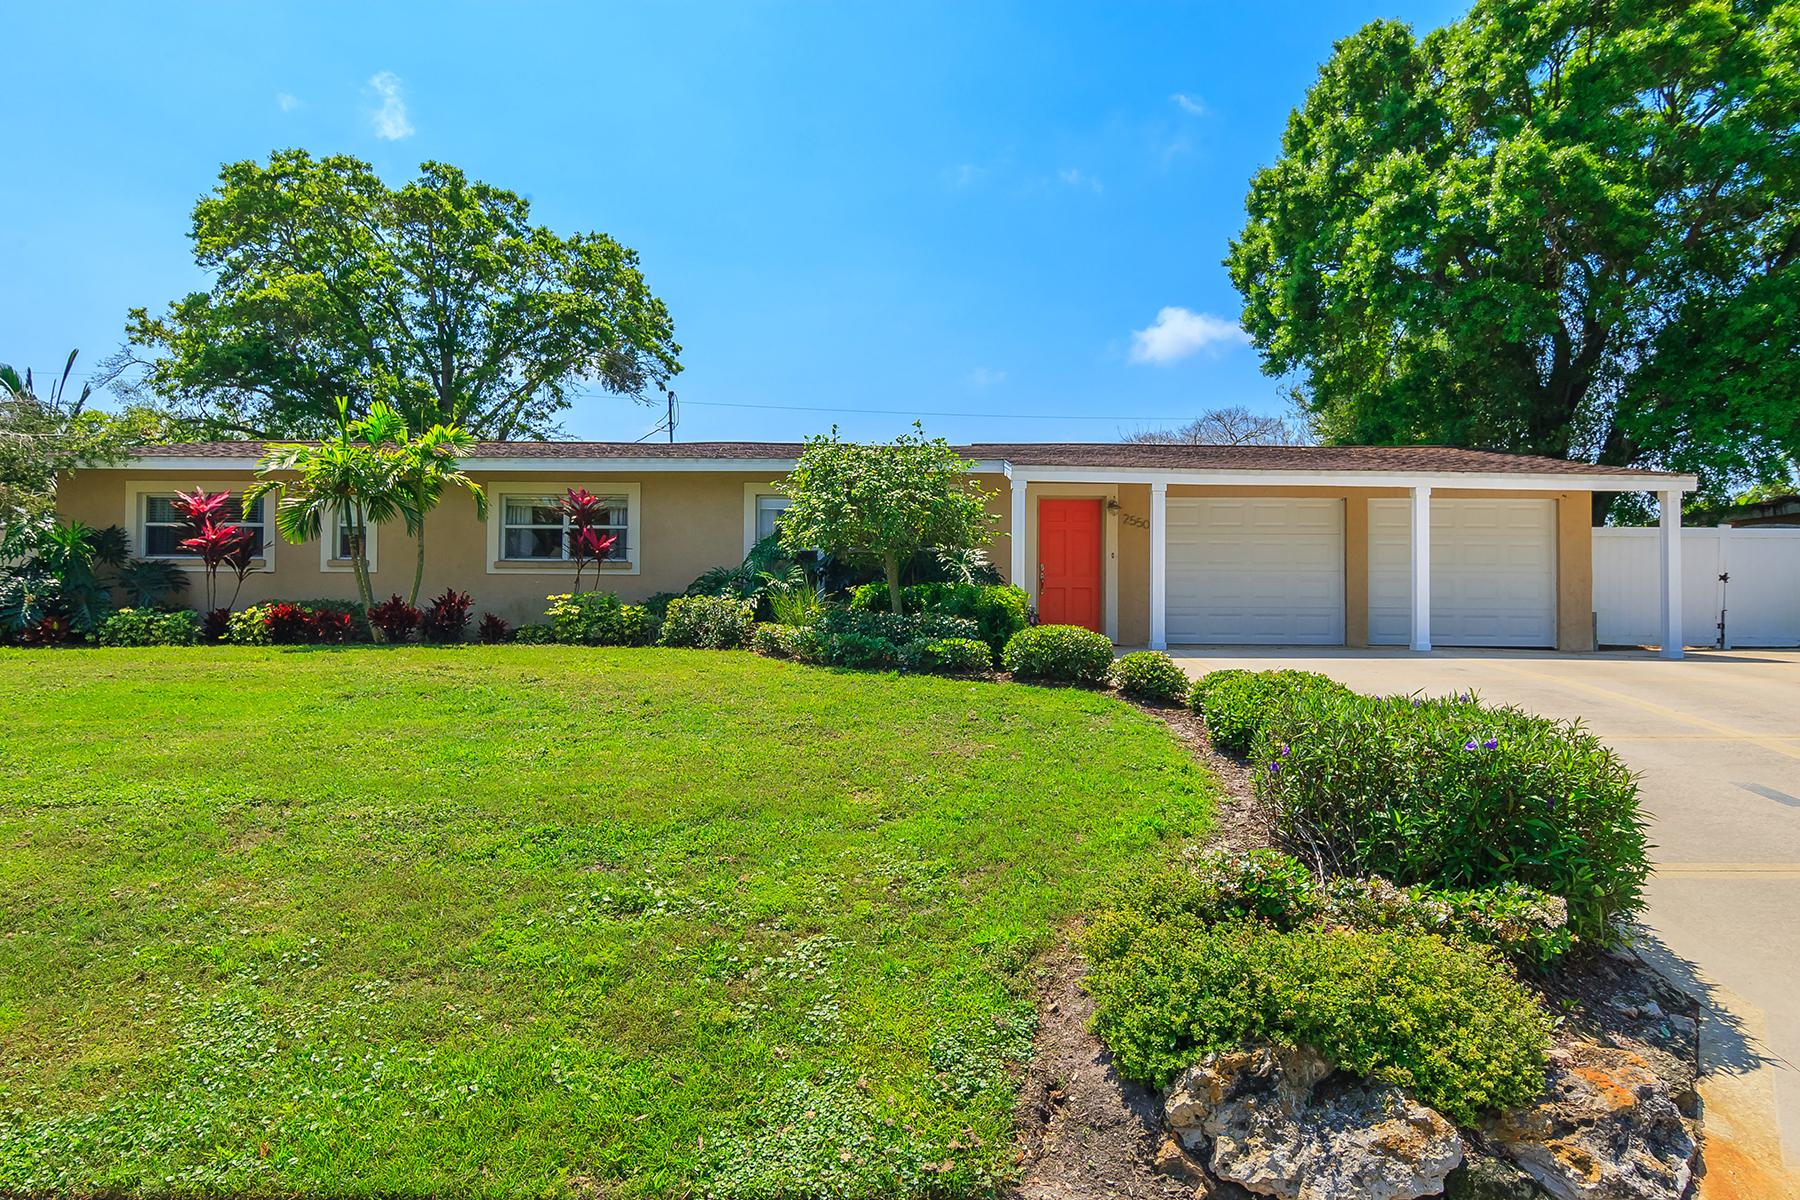 Villa per Vendita alle ore SOUTH GATE 2550 Hibiscus St Sarasota, Florida, 34239 Stati Uniti